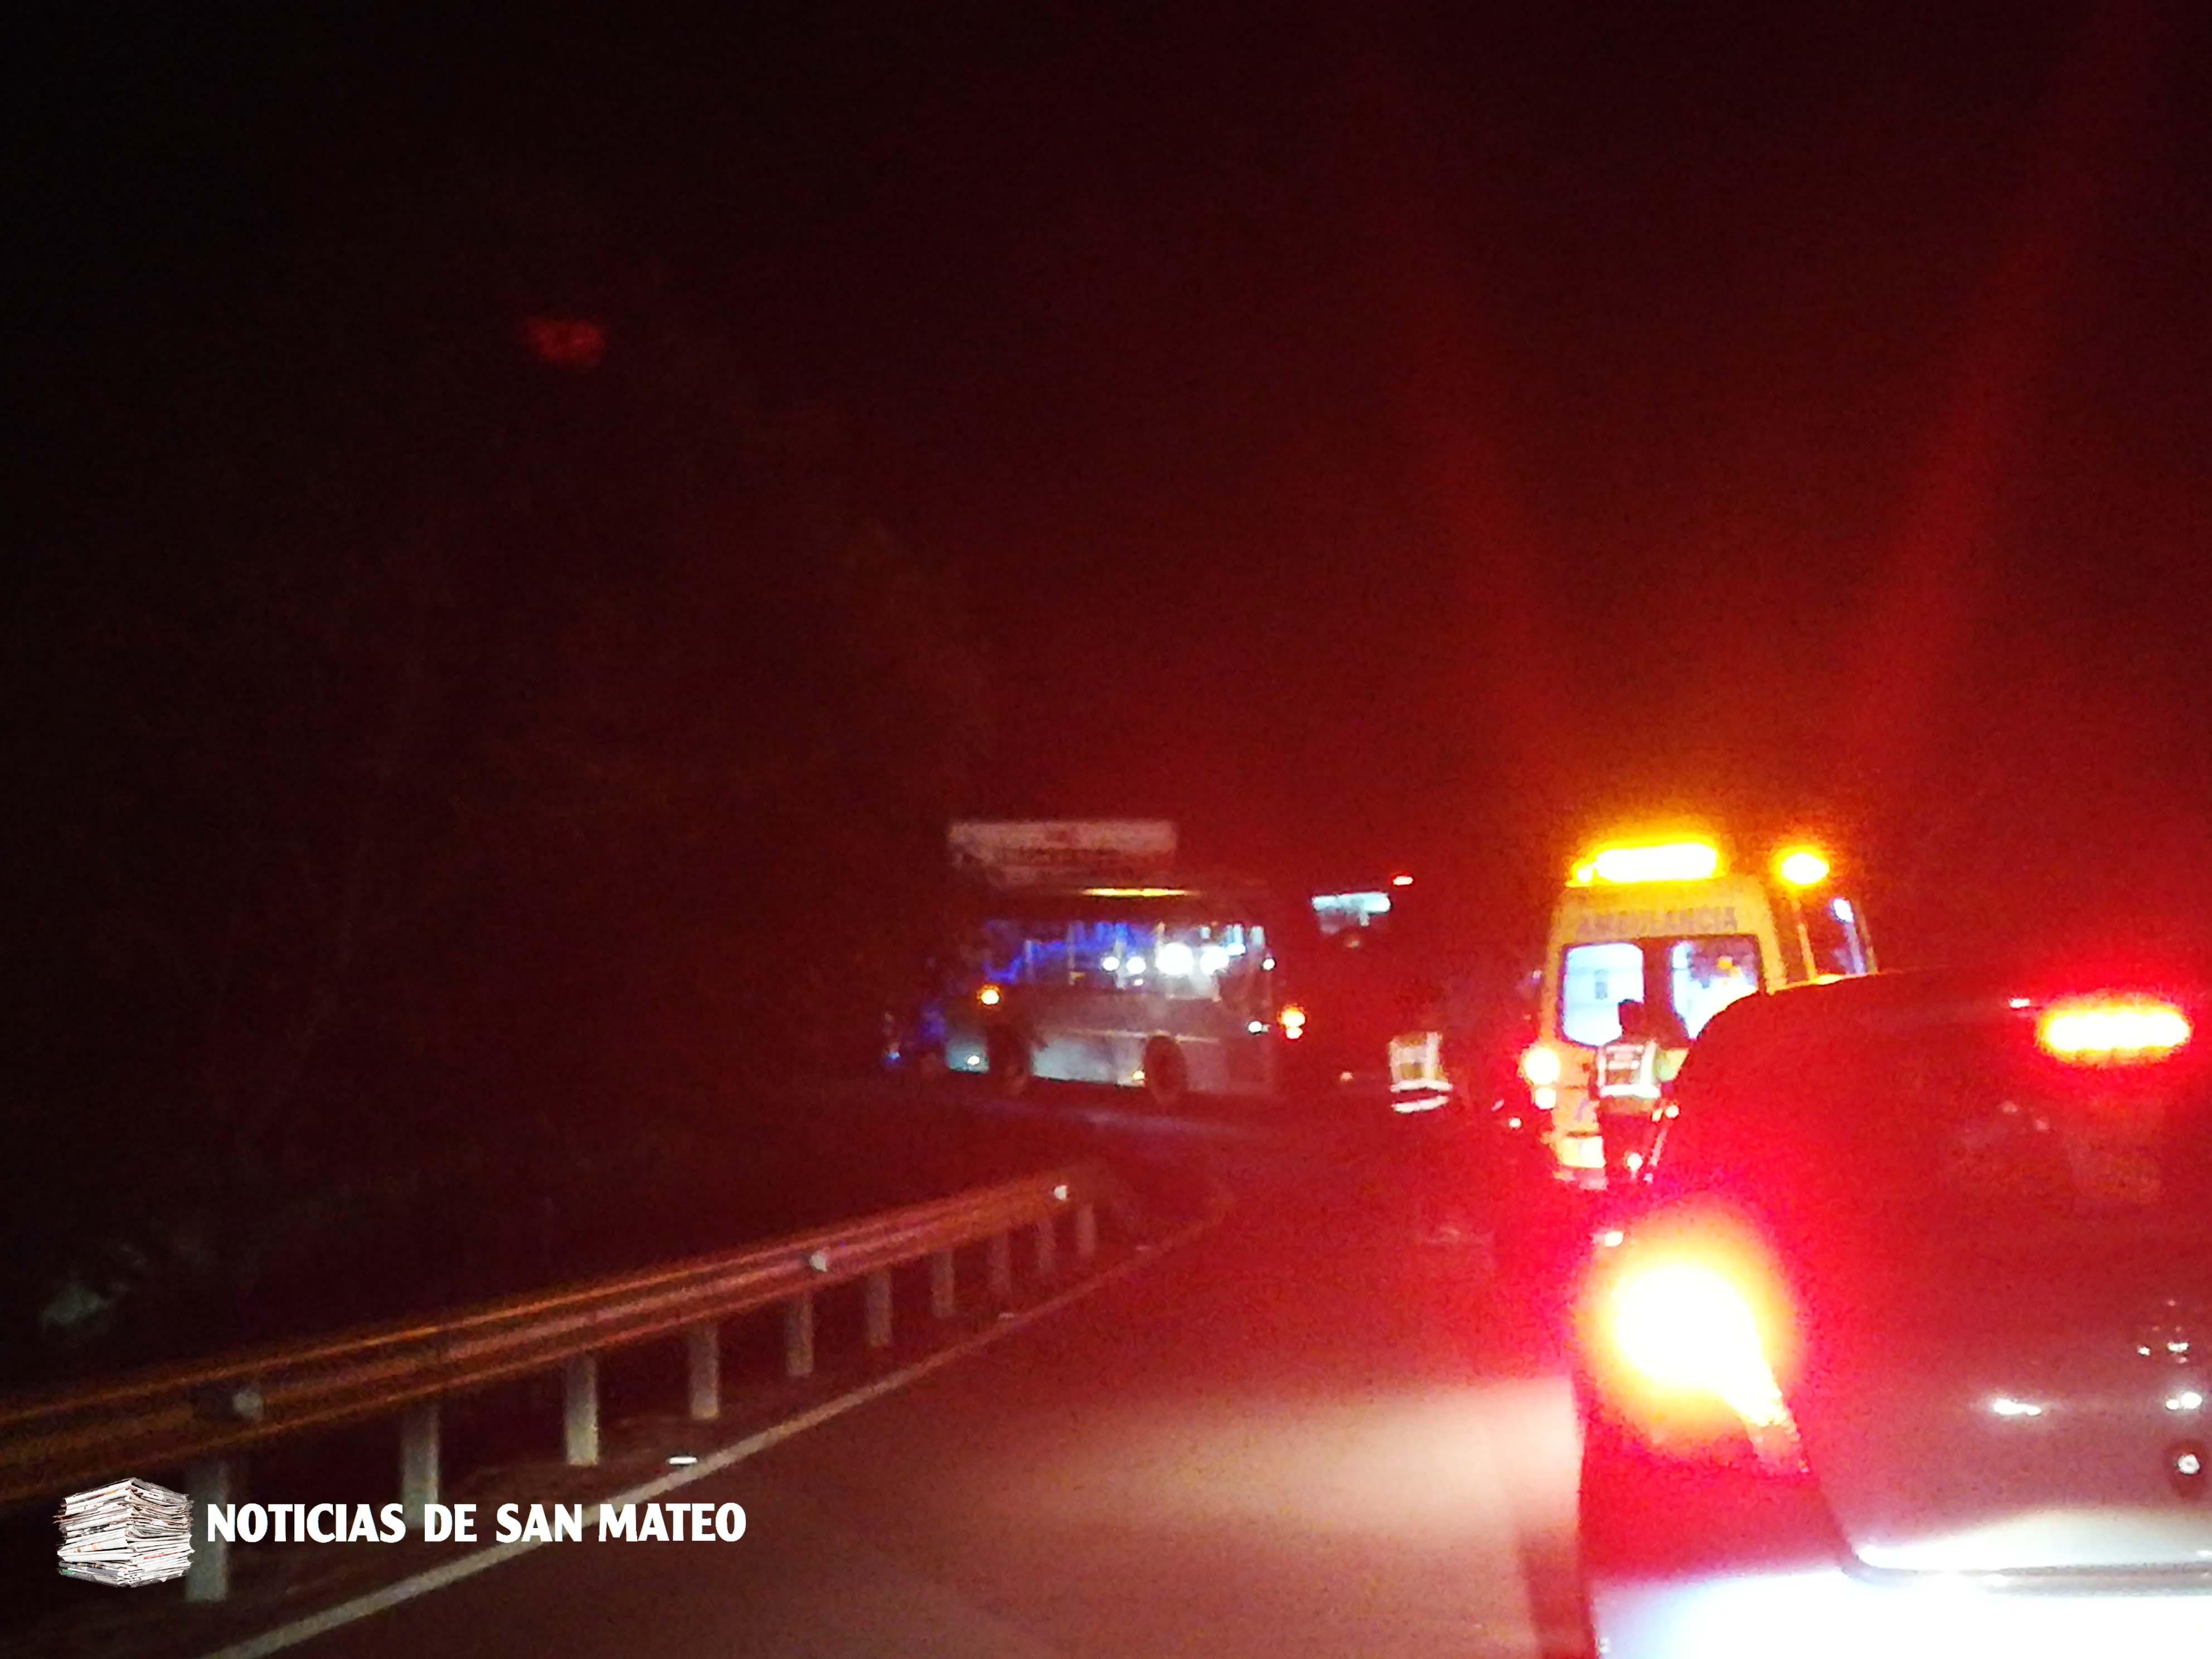 accidente montana cabreja san mateo 24 octubre 2017 noticias de san mateo foto laura miranda